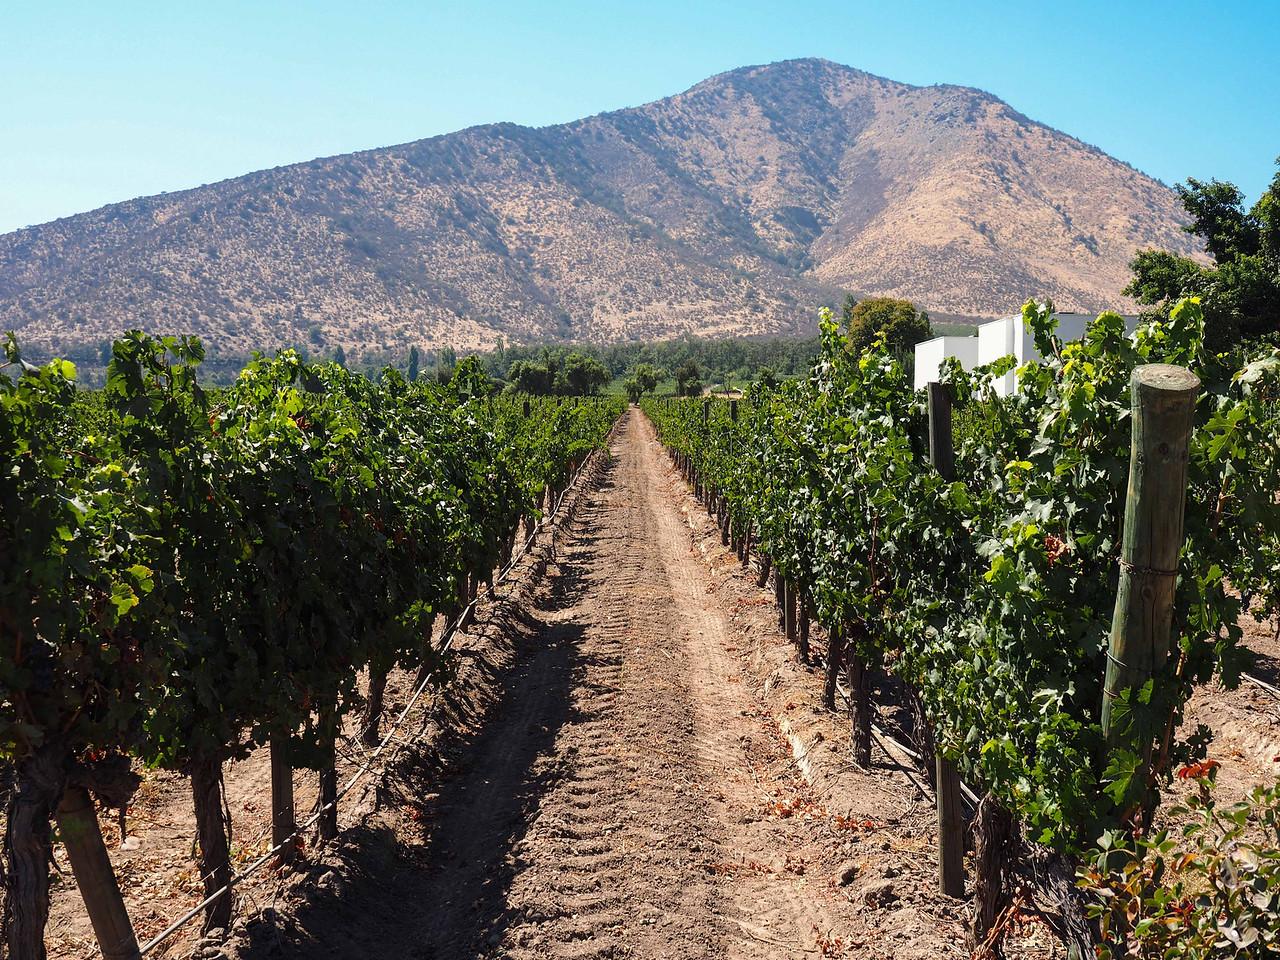 The vineyard (looks like California)